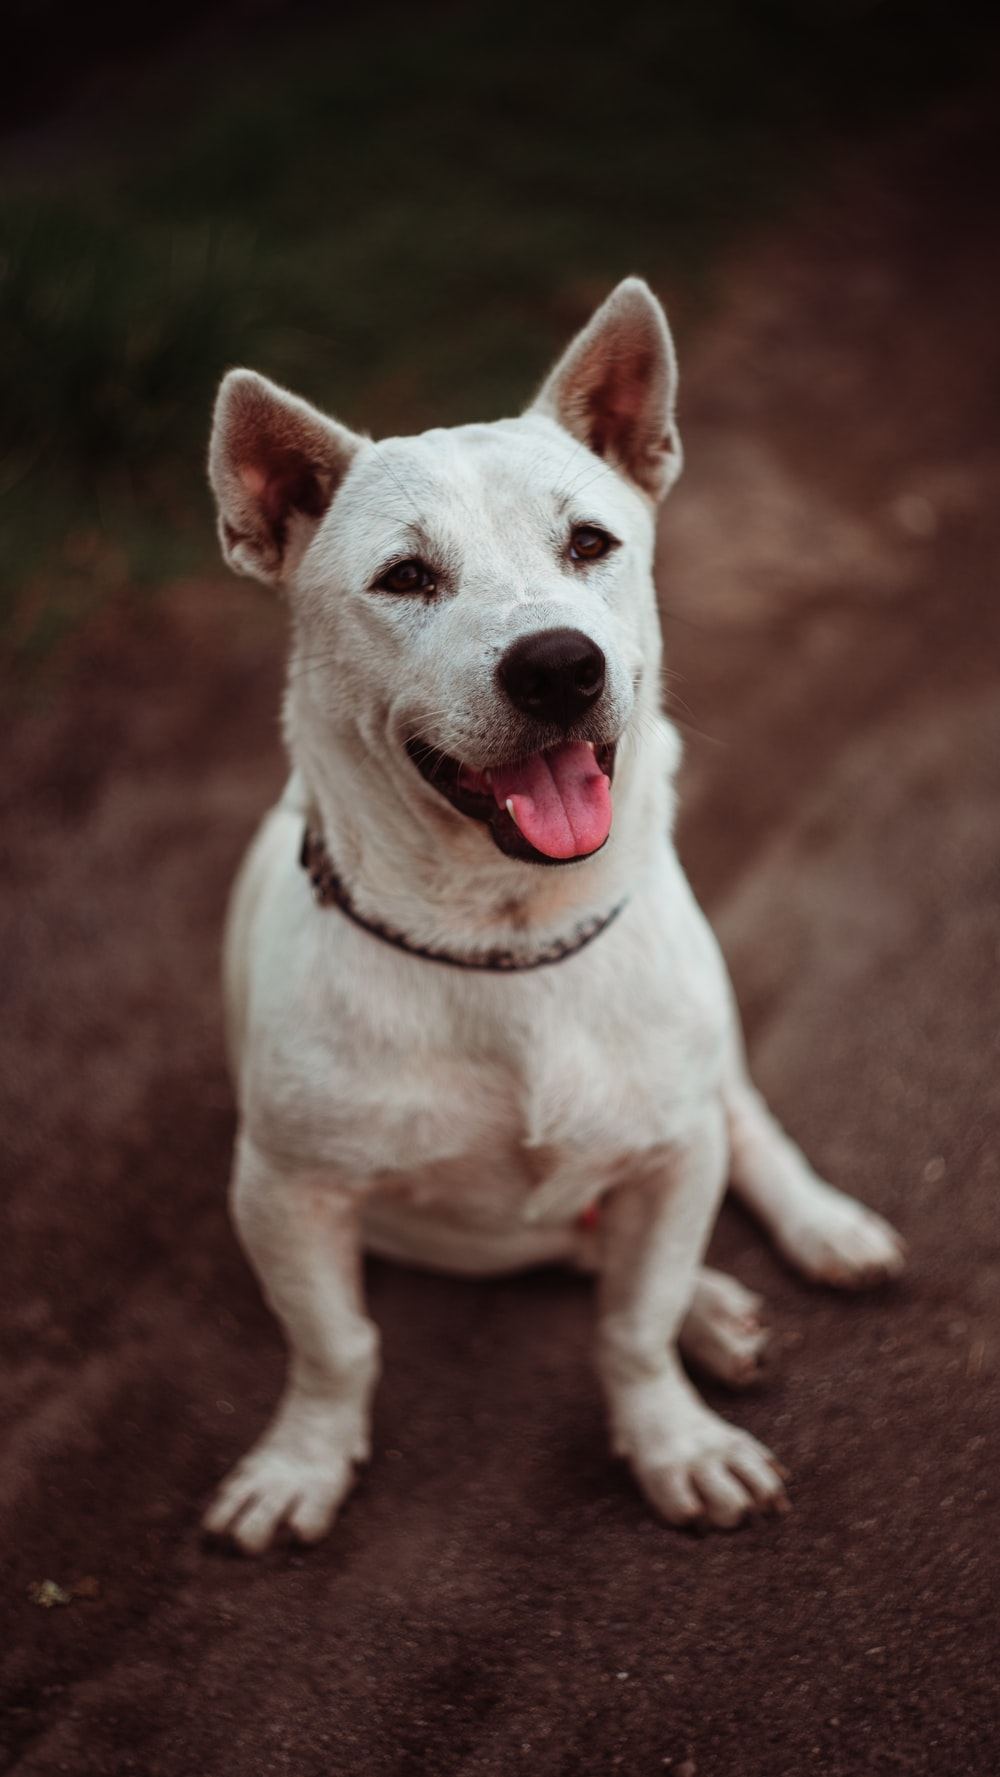 white short coated dog sitting on brown ground